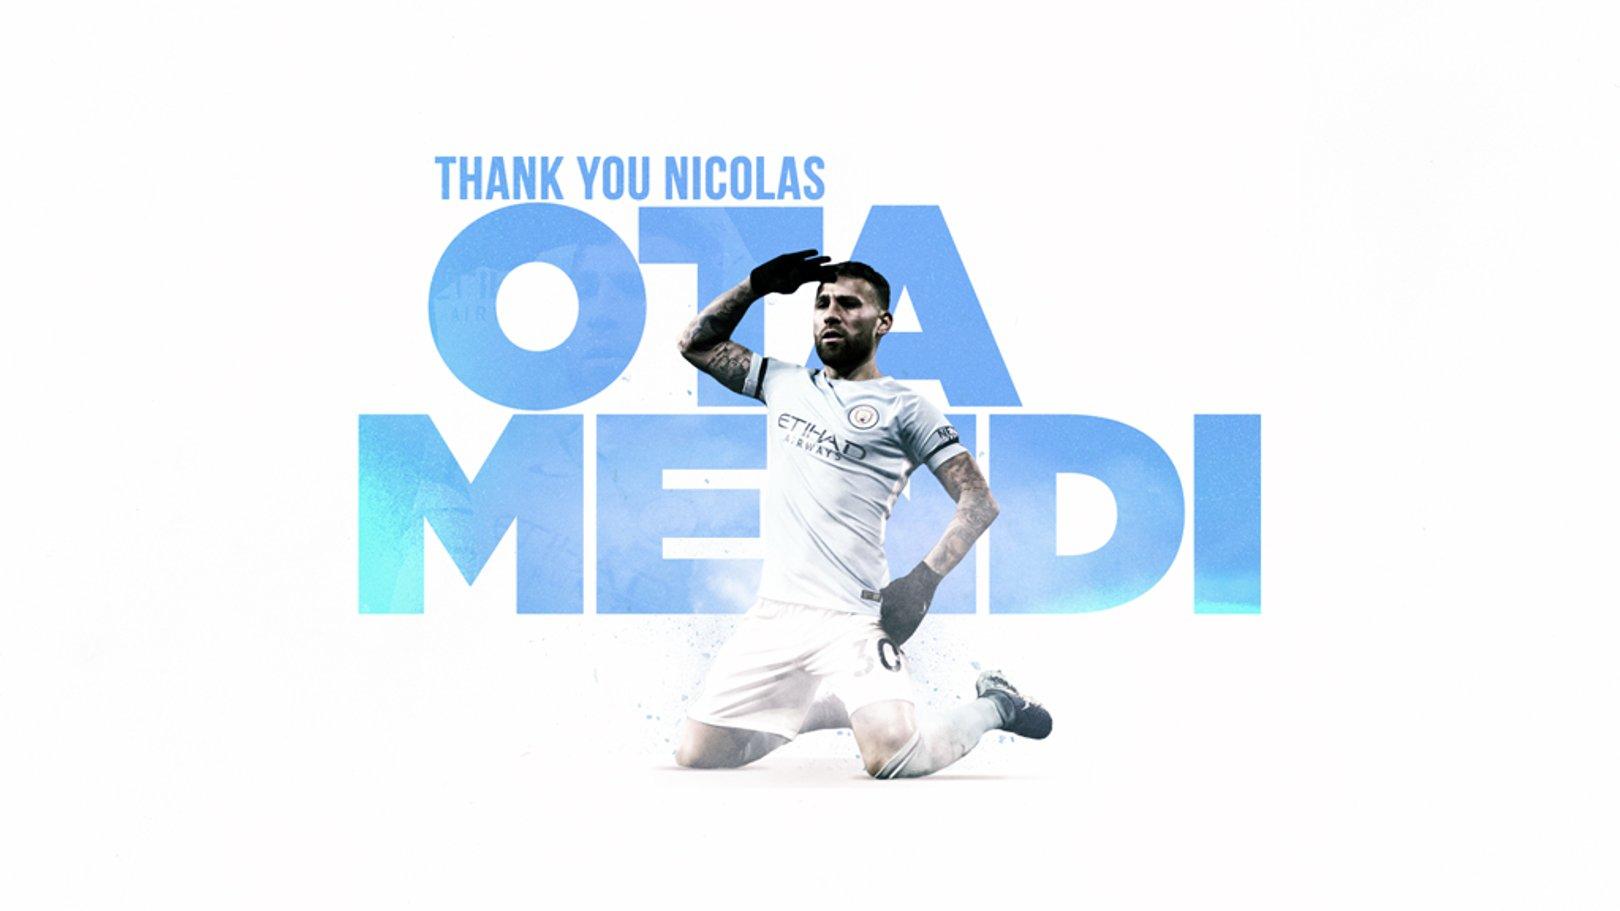 Nicolas Otamendi joins Benfica